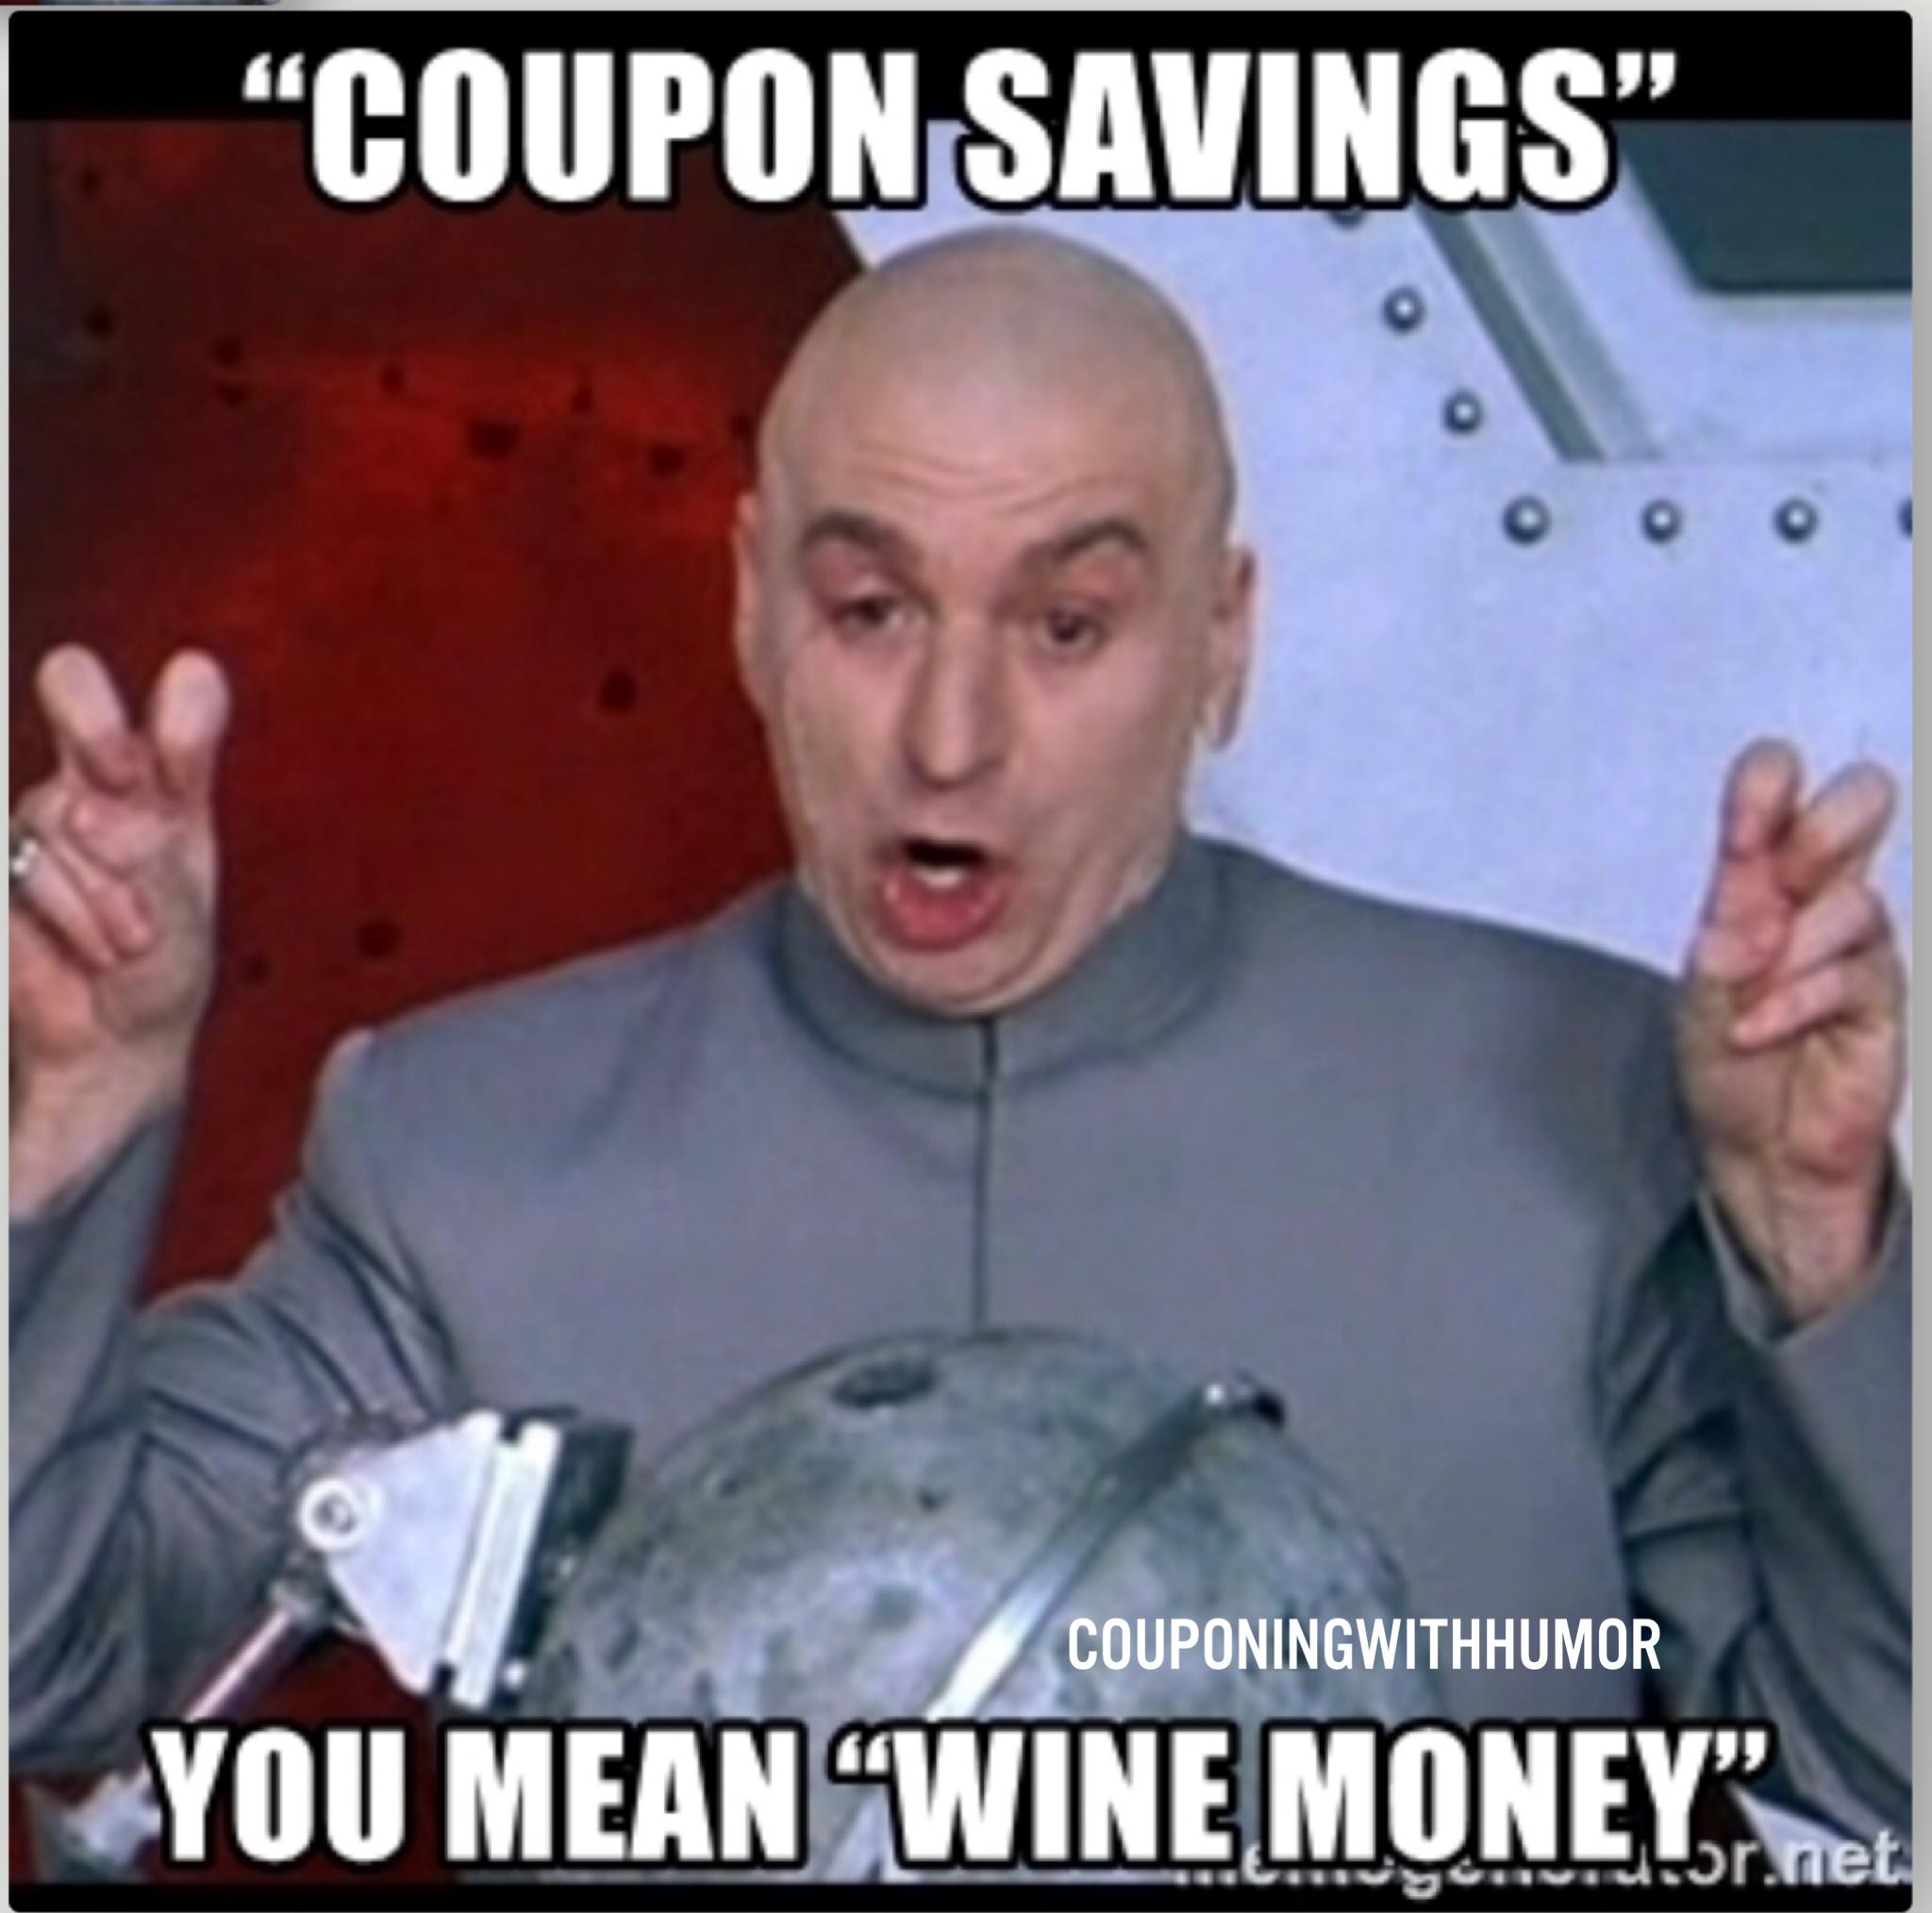 Coupon savings? You mean wine money? couponhumor